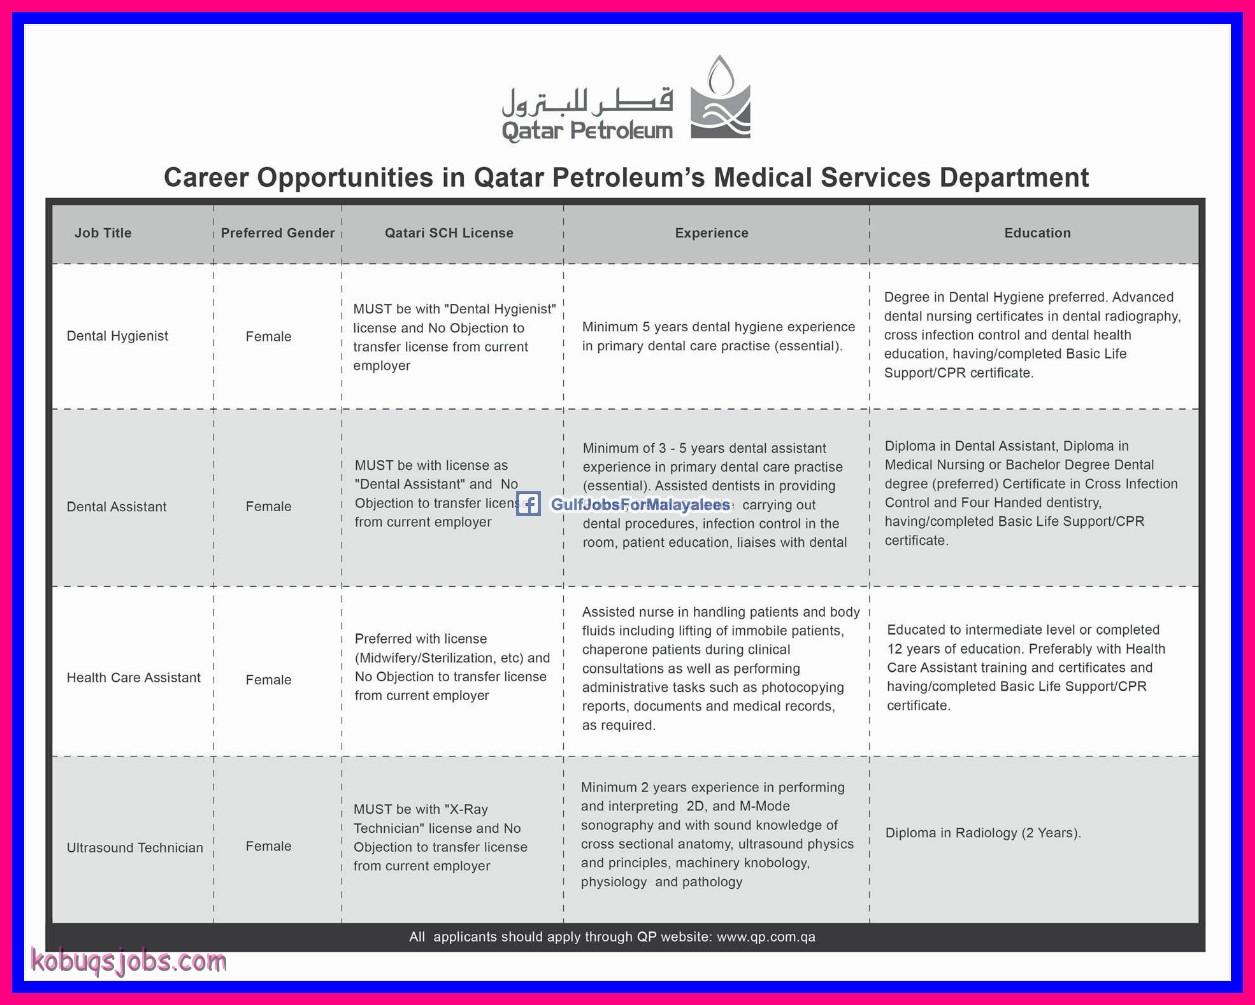 jobs in qatar petroleum medical service department